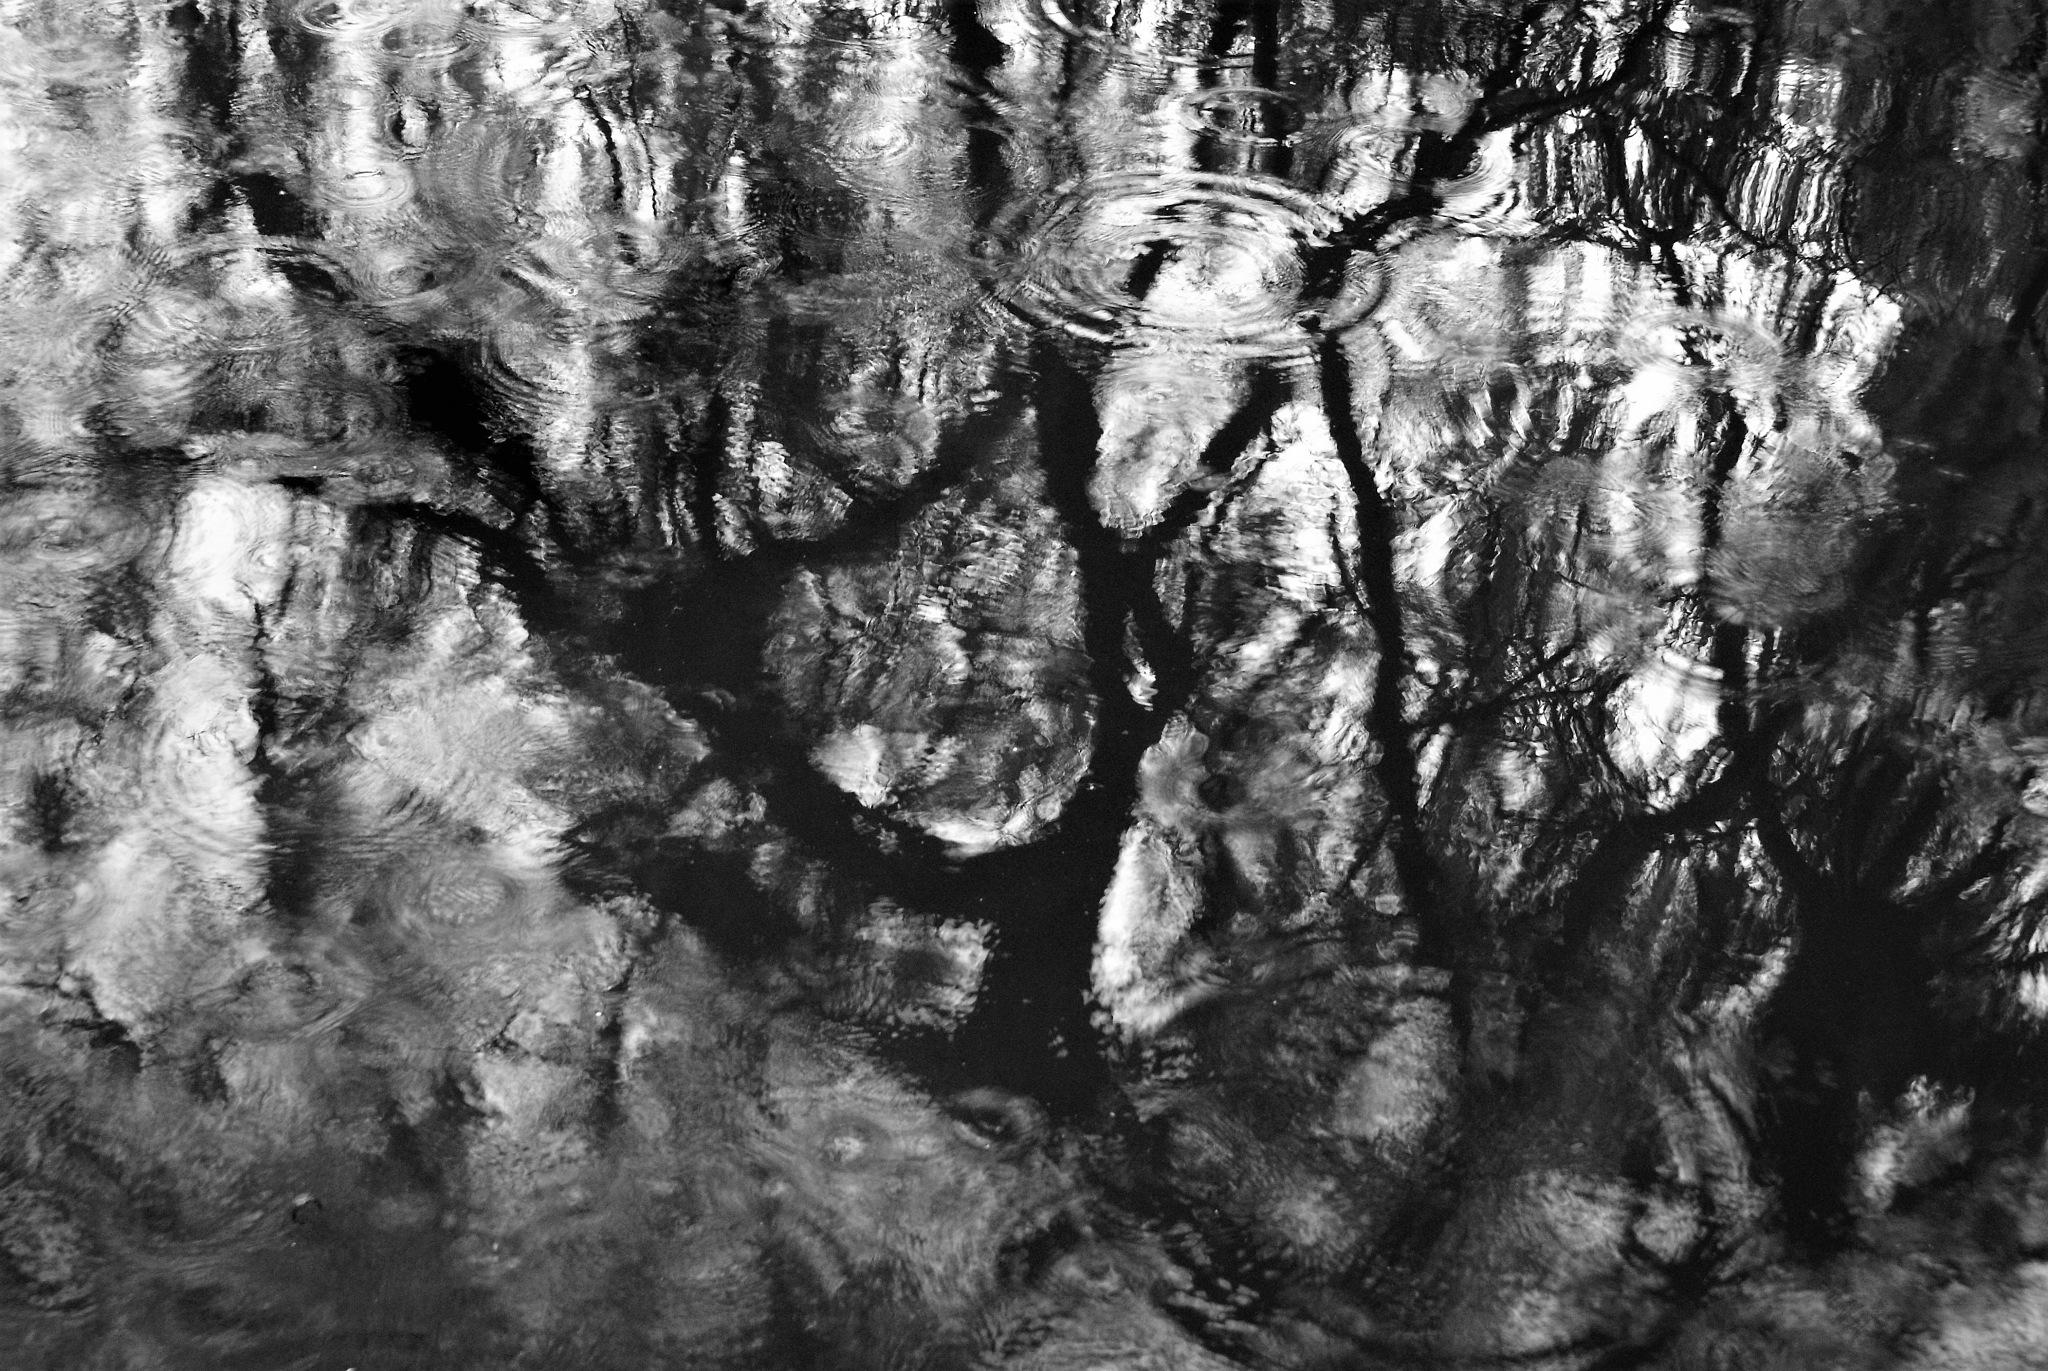 Raindrops And Reflections by DenisJosephDalby